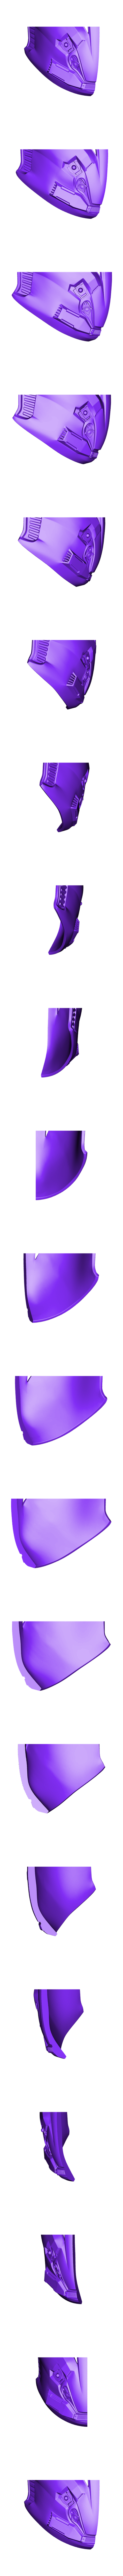 Part_3.stl Download free STL file Arcann Mask Star Wars • 3D print template, VillainousPropShop